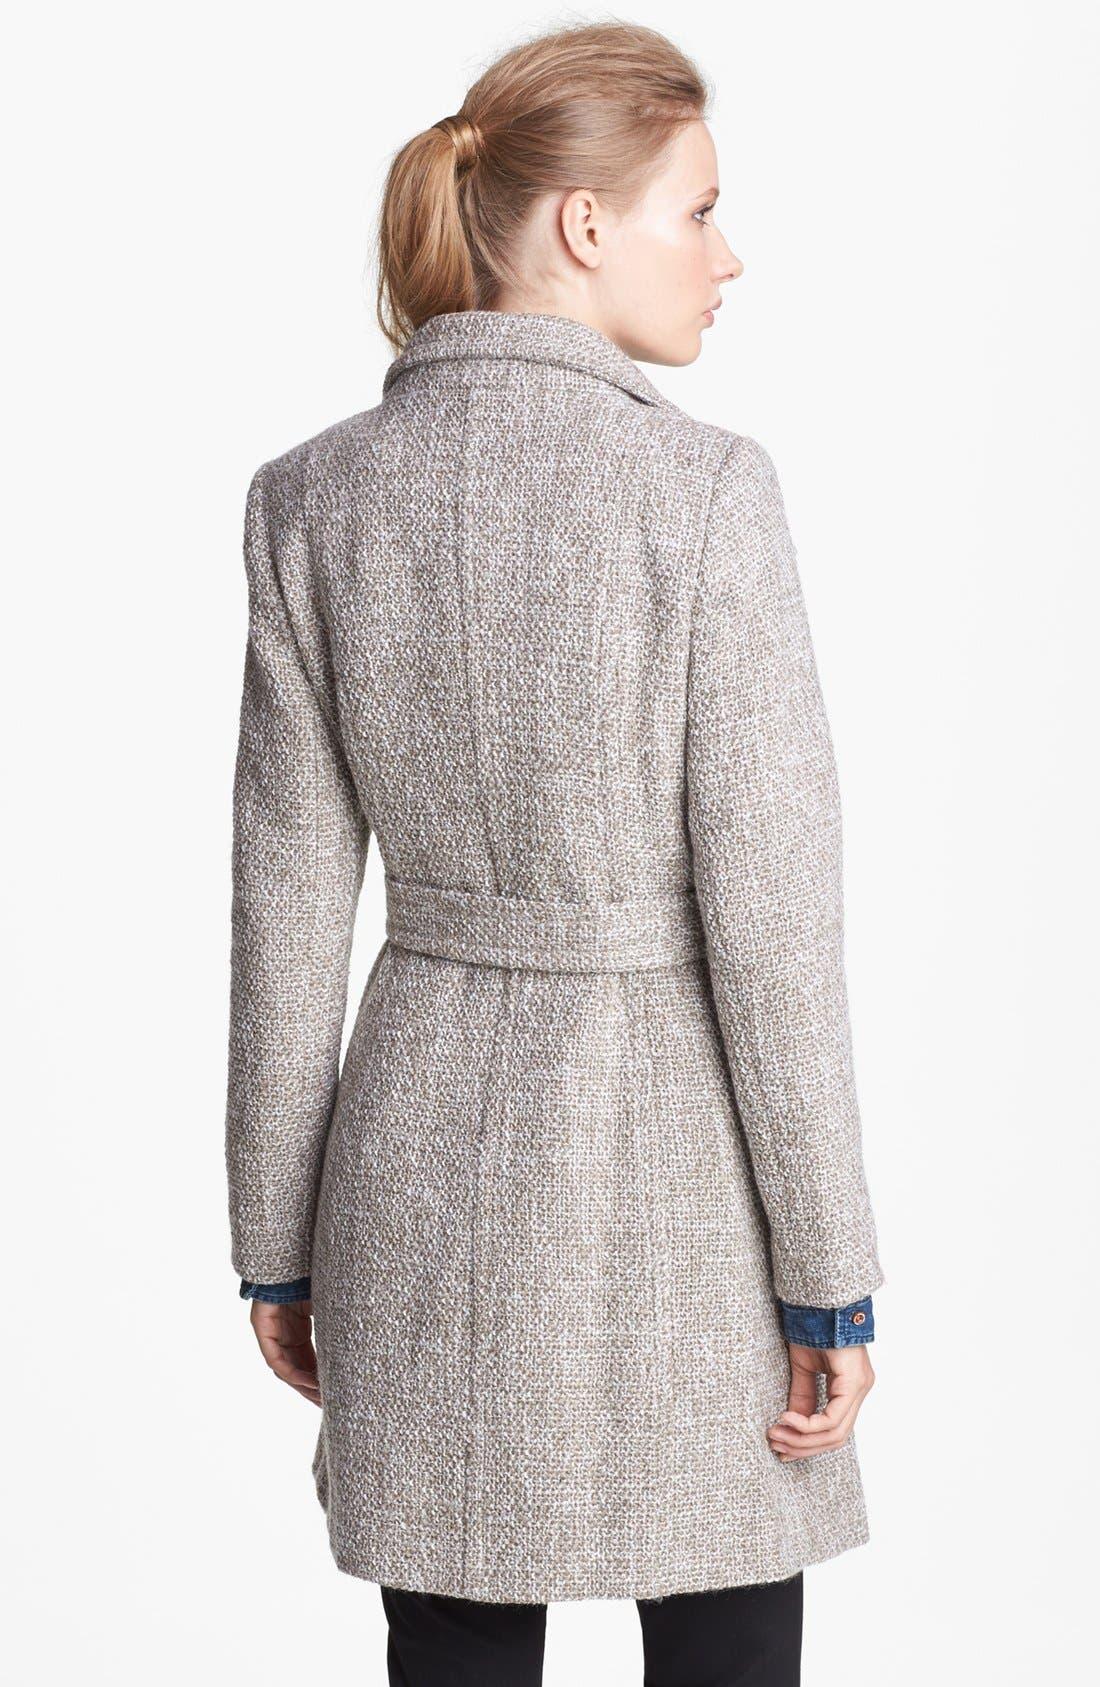 T TAHARI, 'Izzy' Belted Tweed Coat, Alternate thumbnail 3, color, 200